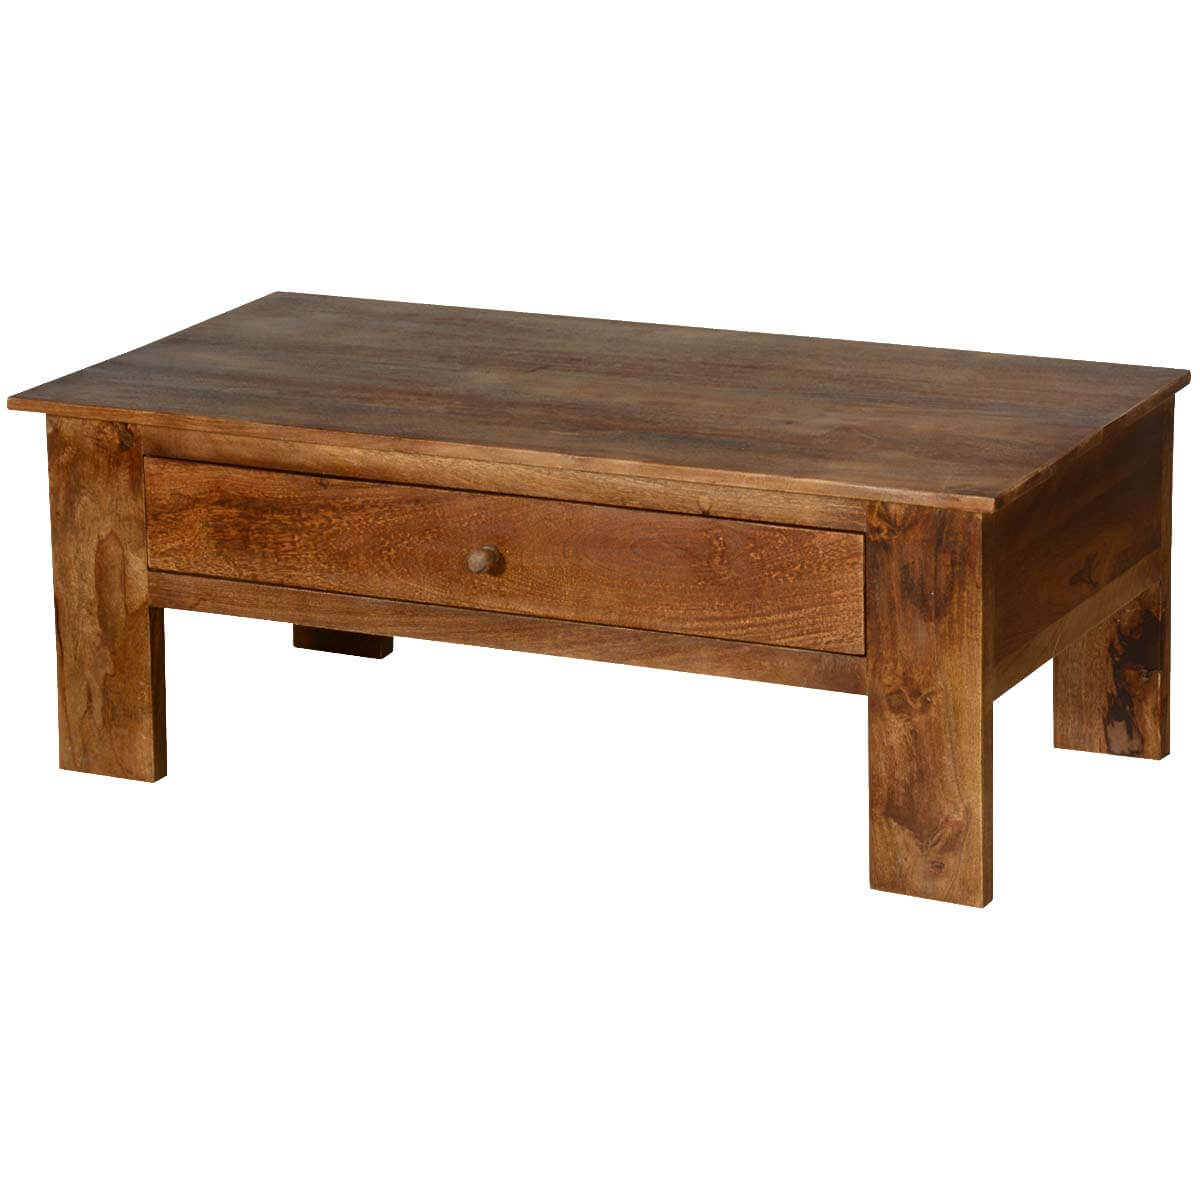 pioneer rustic solid mango wood 42 coffee table w hidden. Black Bedroom Furniture Sets. Home Design Ideas